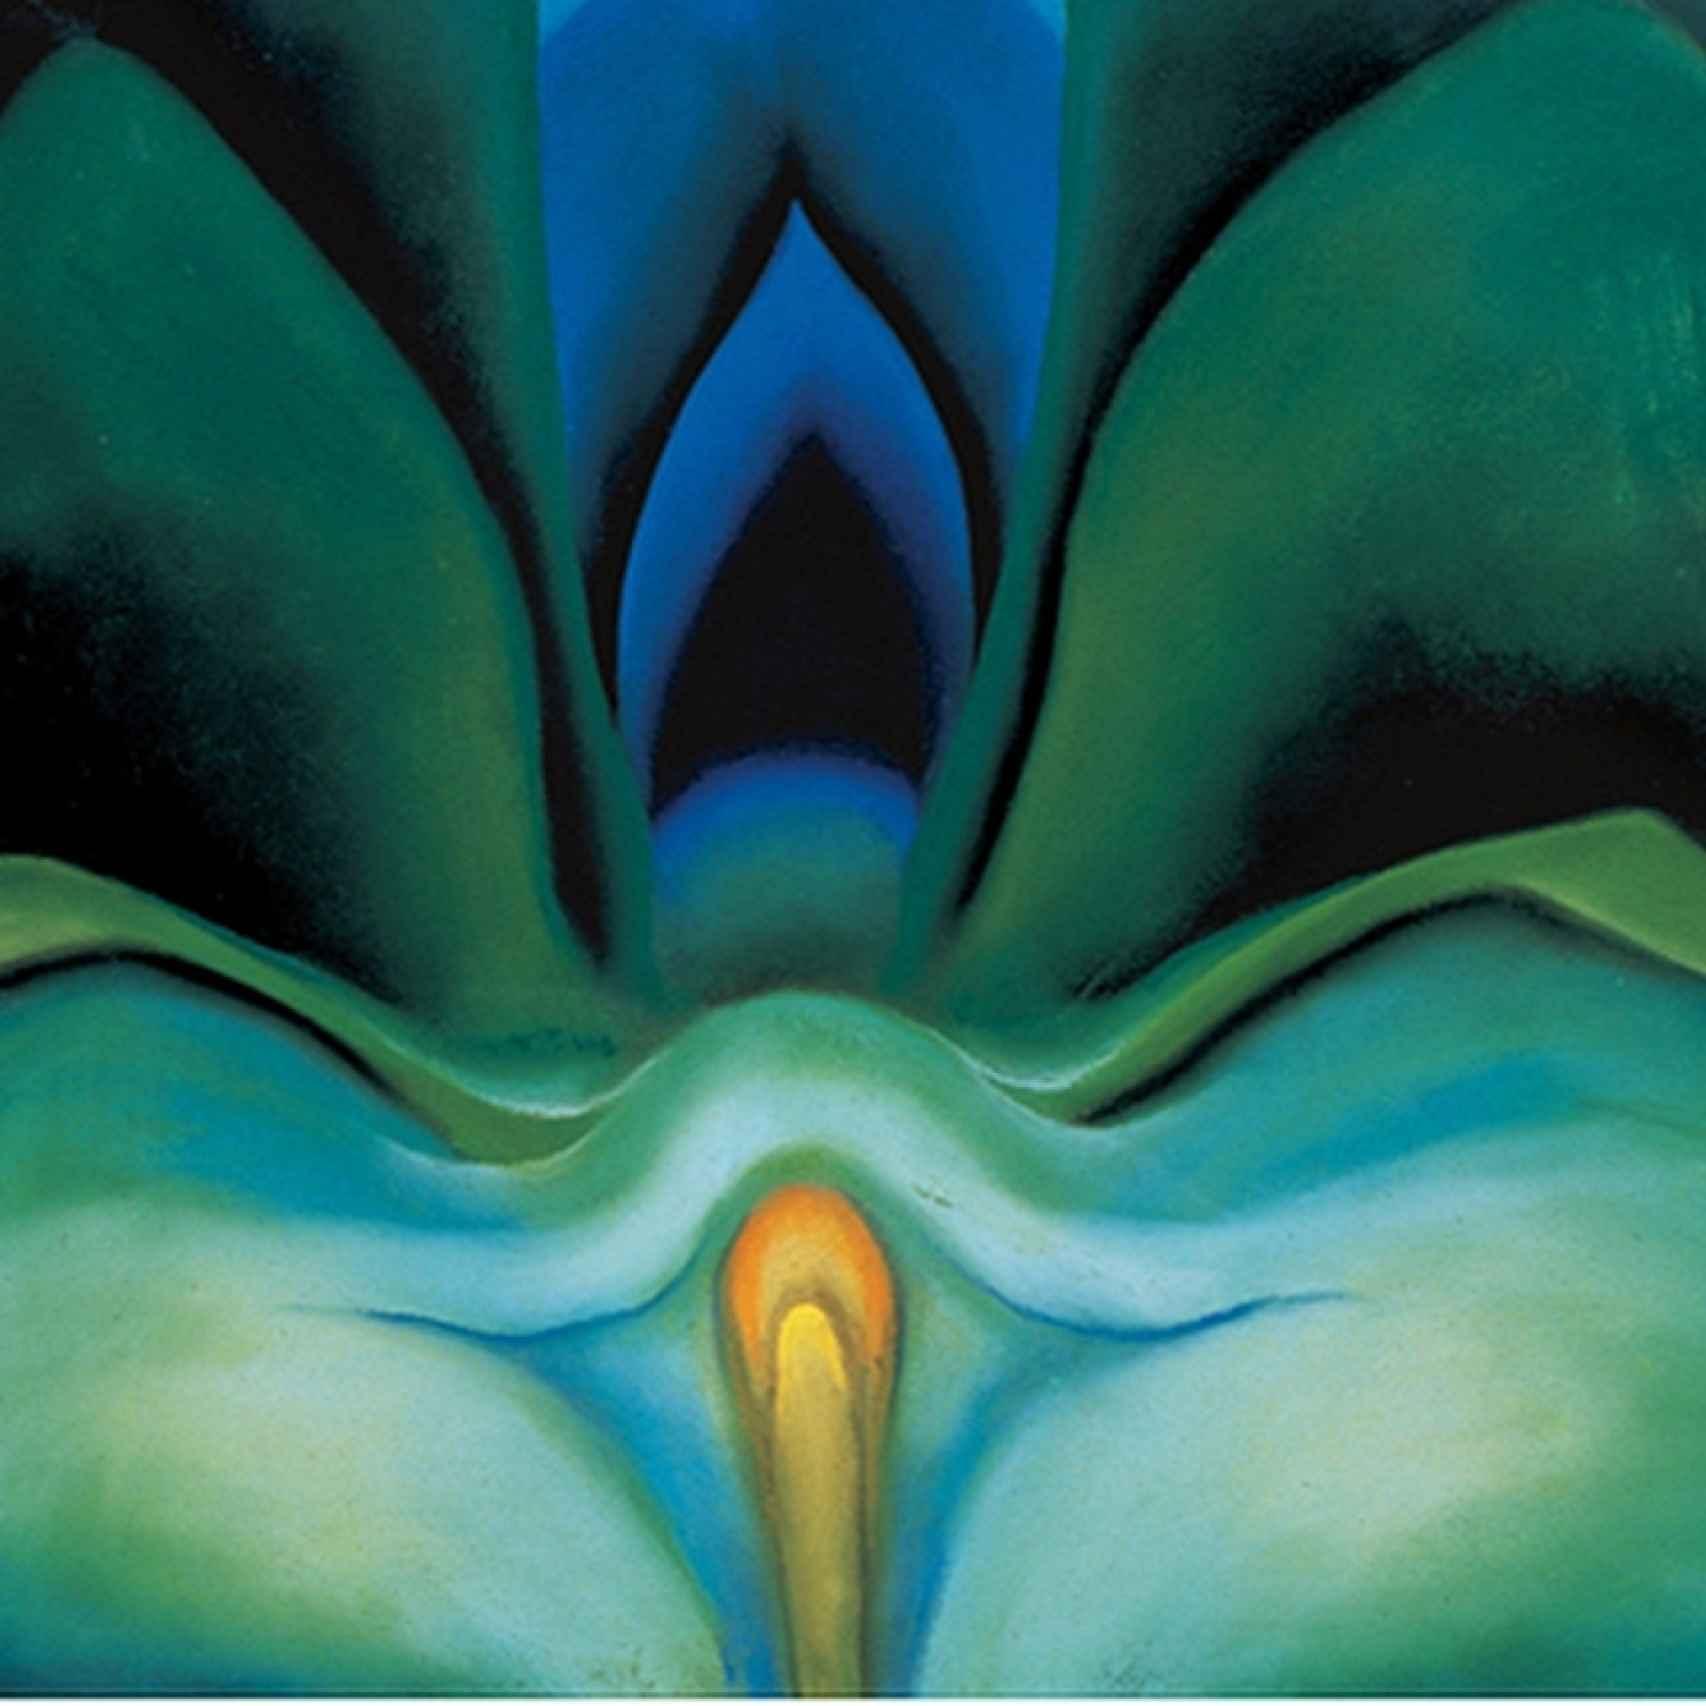 Blue Flowers, de la pintora Georgia O'Keeffe.